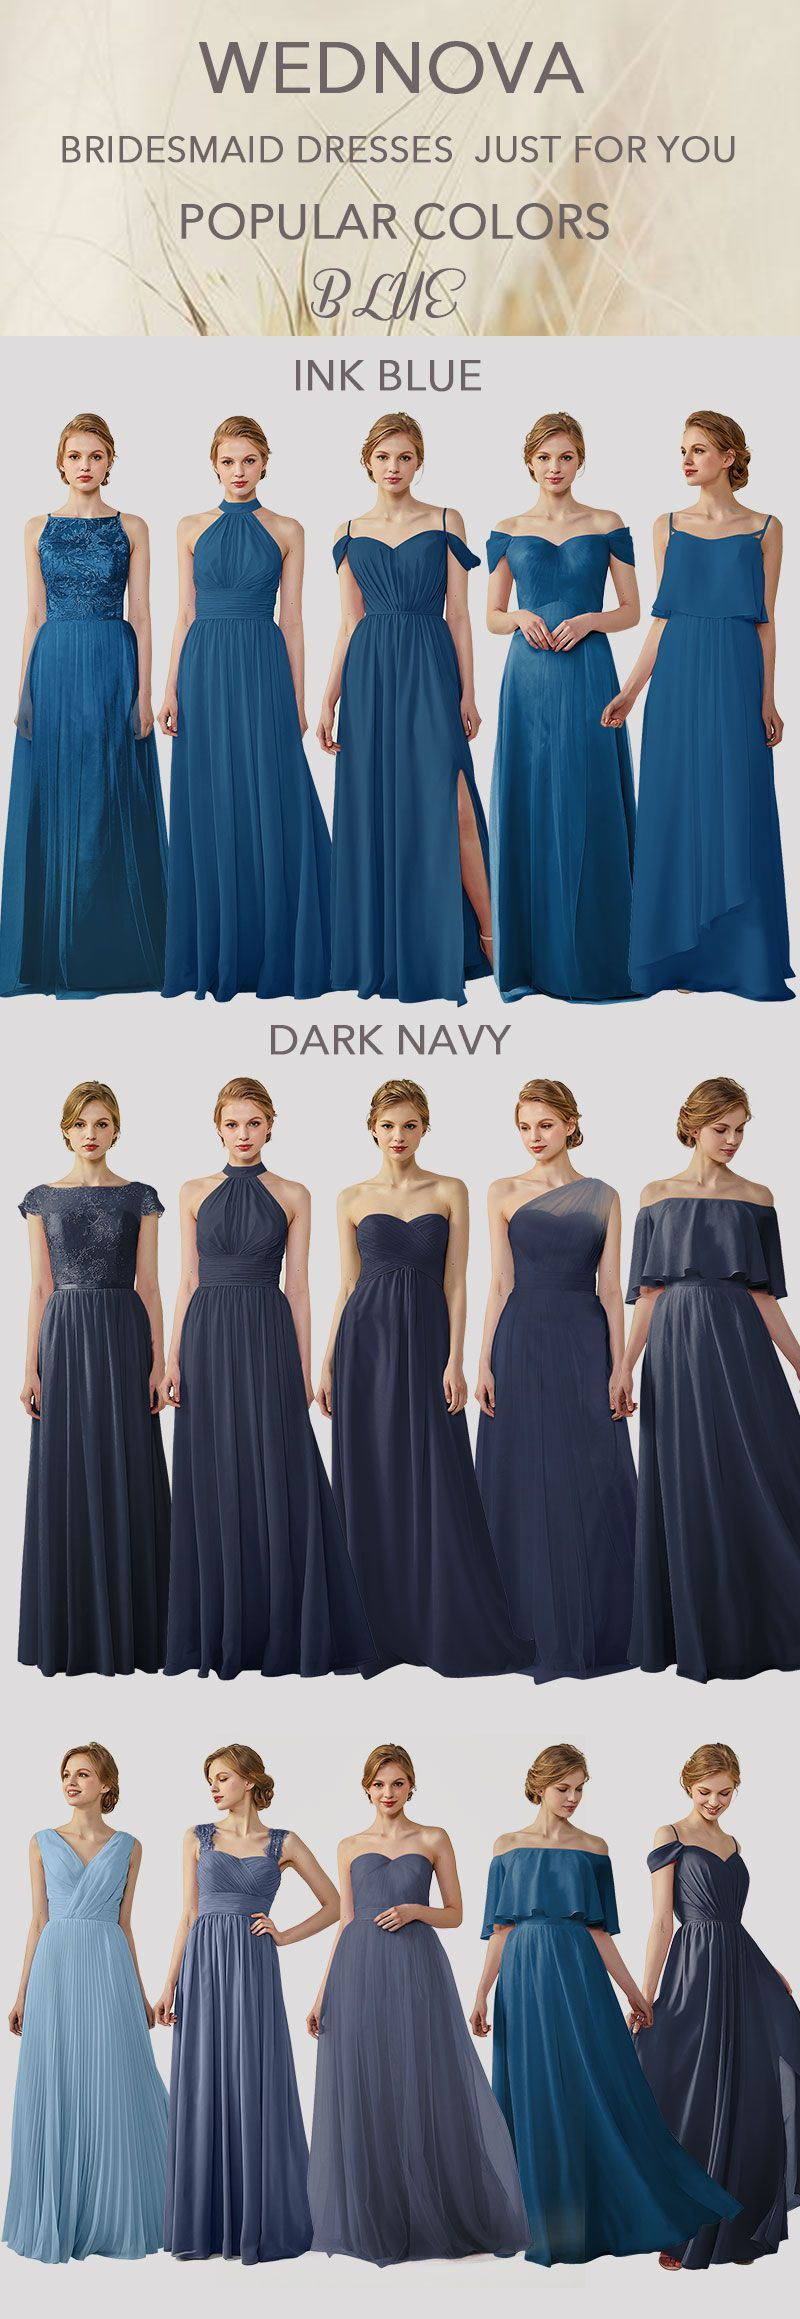 best chiffon bridesmaid dresses ink blue perfect dark navy